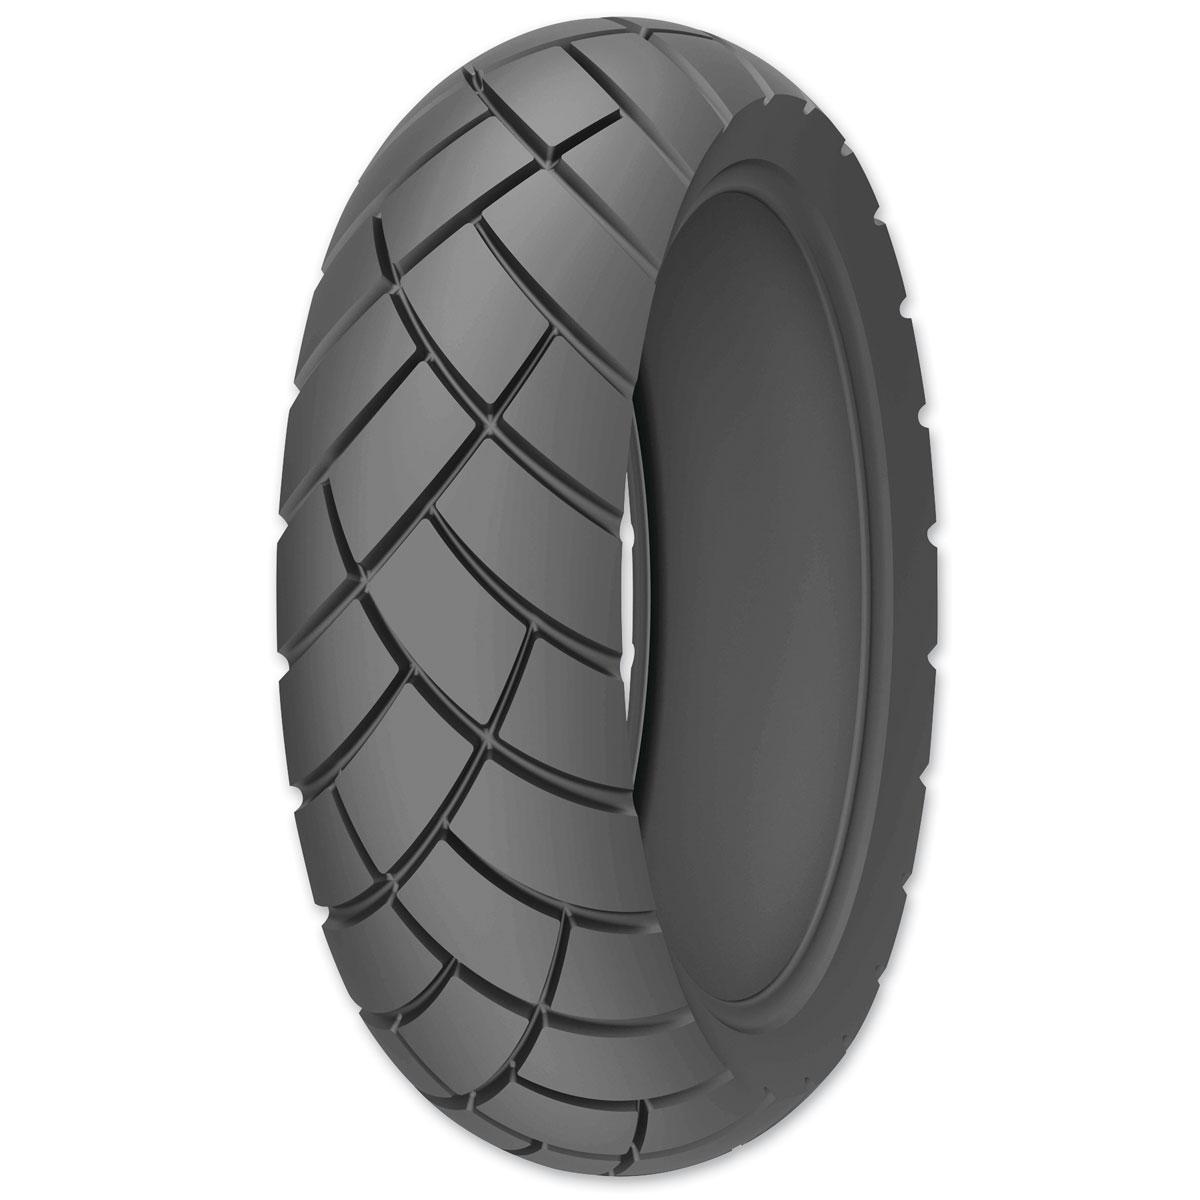 Kenda Tires K678 Paver 130/80B17 Rear Tire